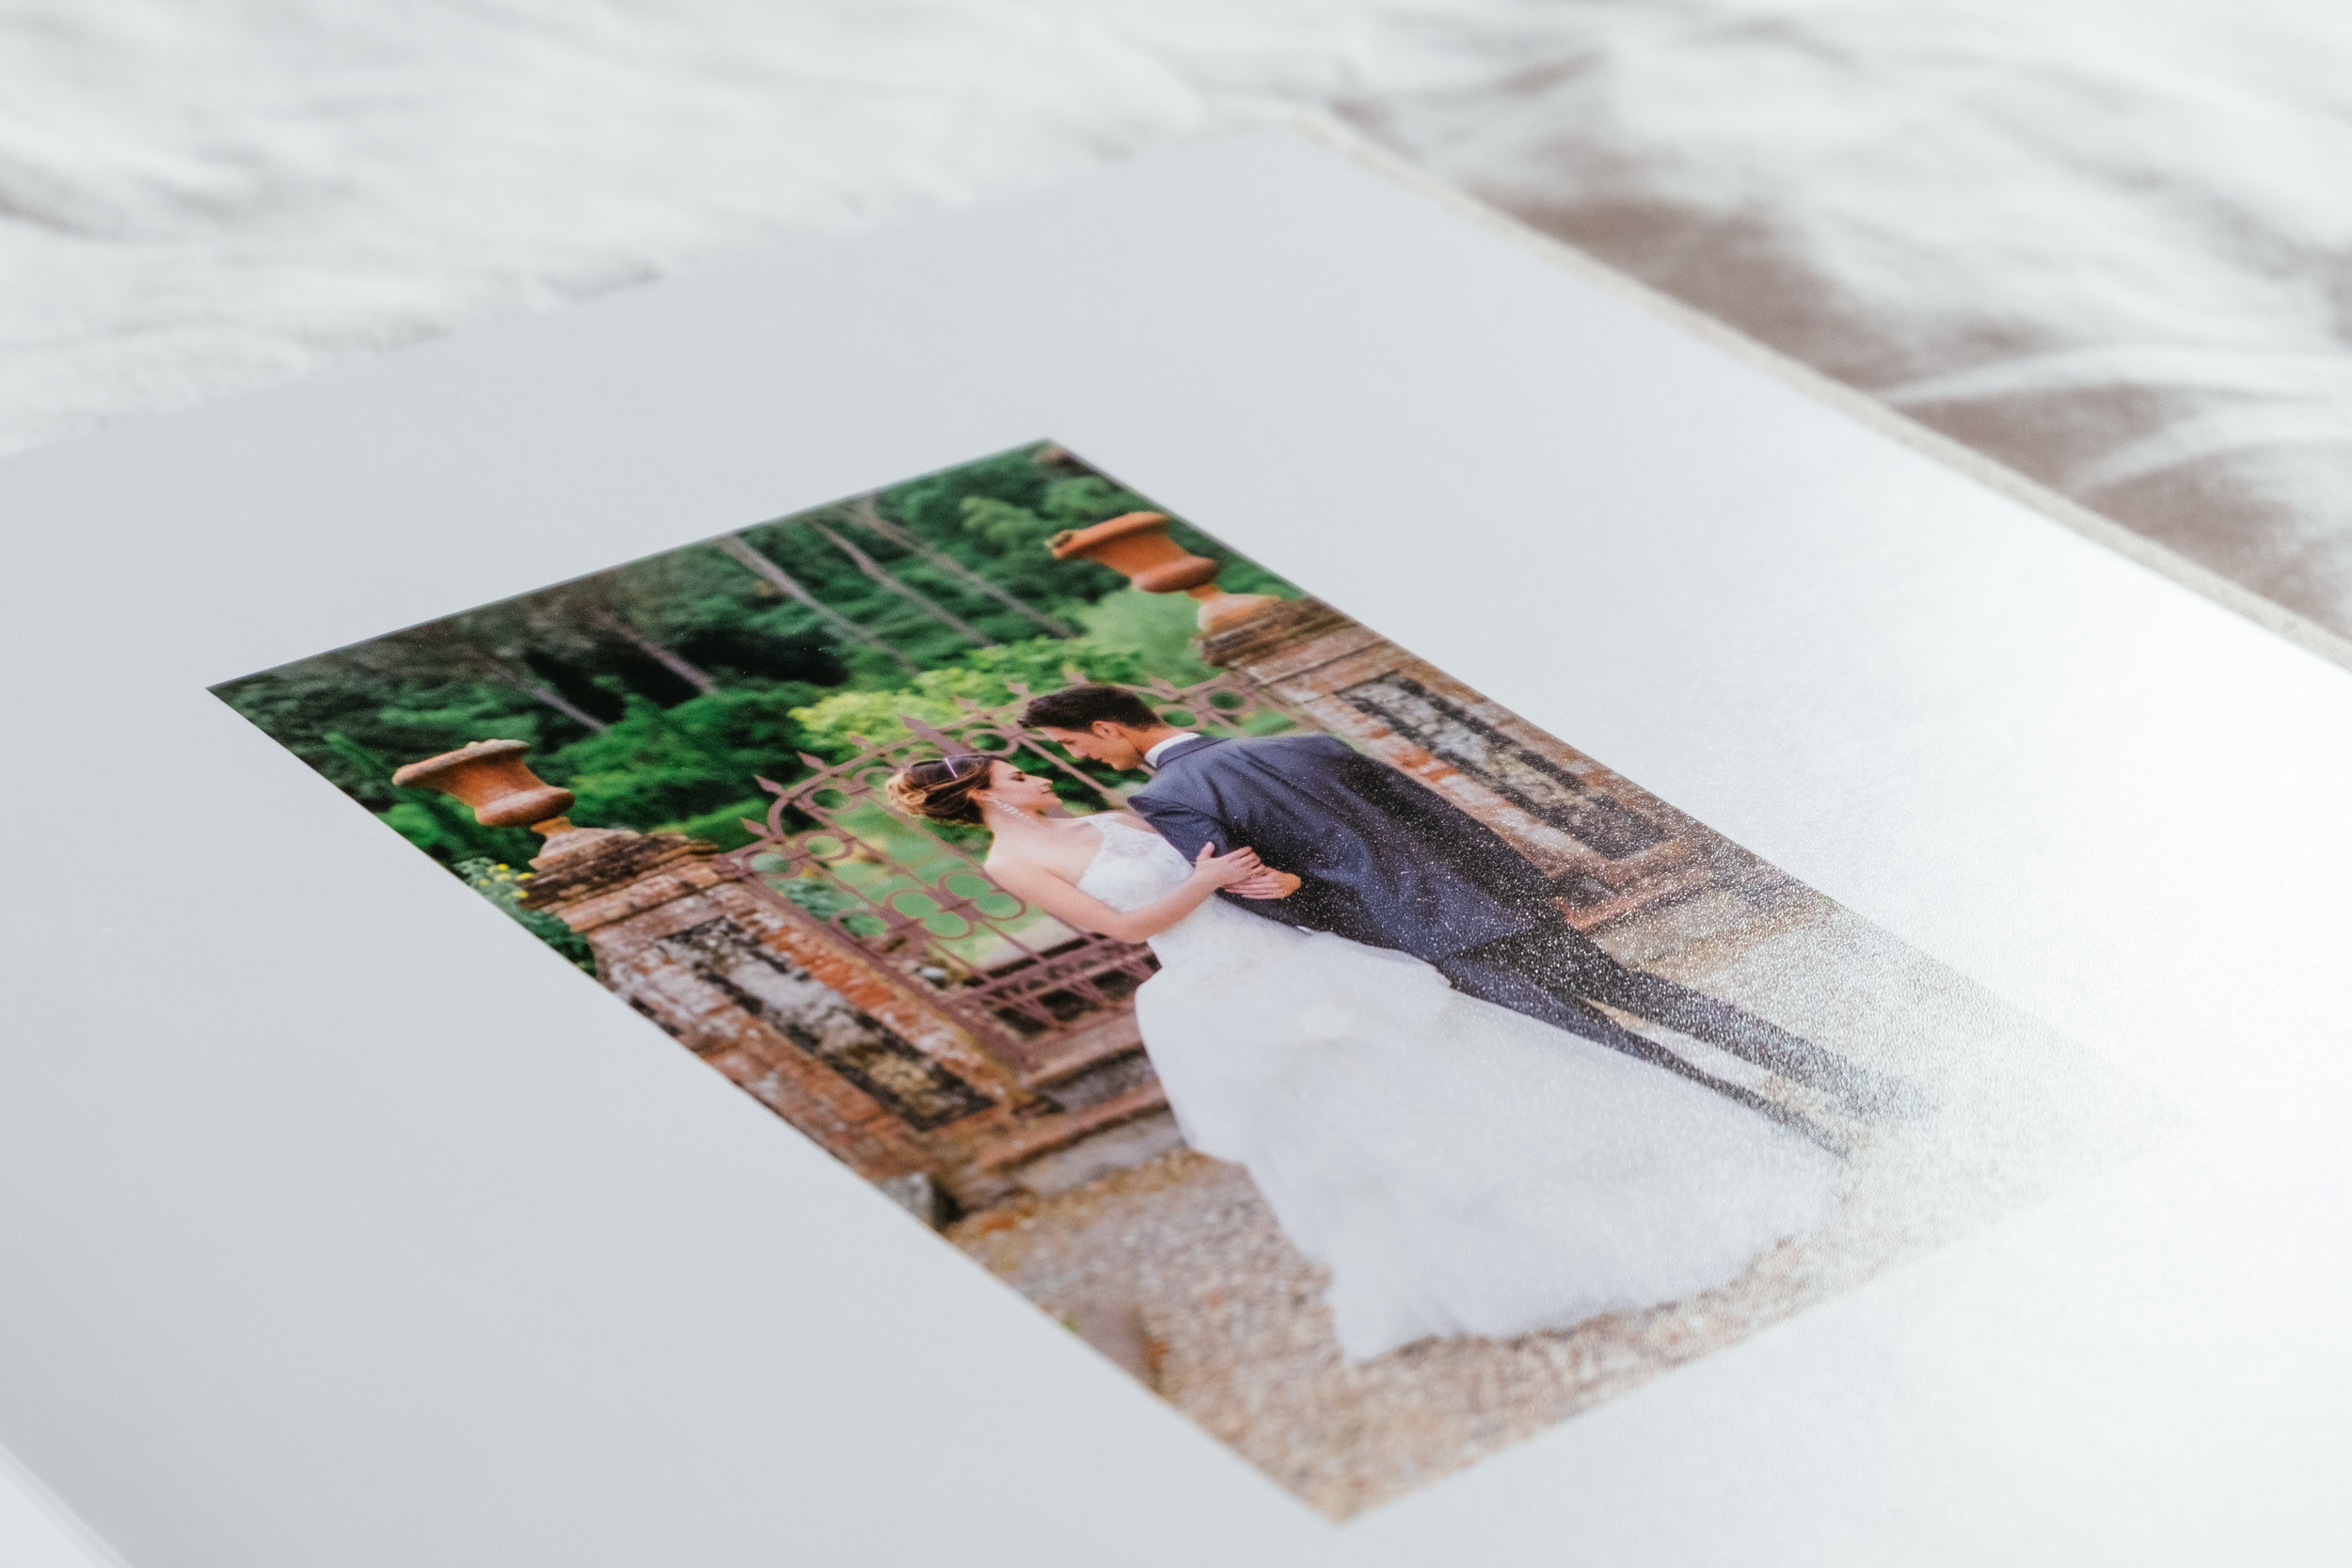 Fuji Lustre (Aria Book, Bloom Book & DuoBook)